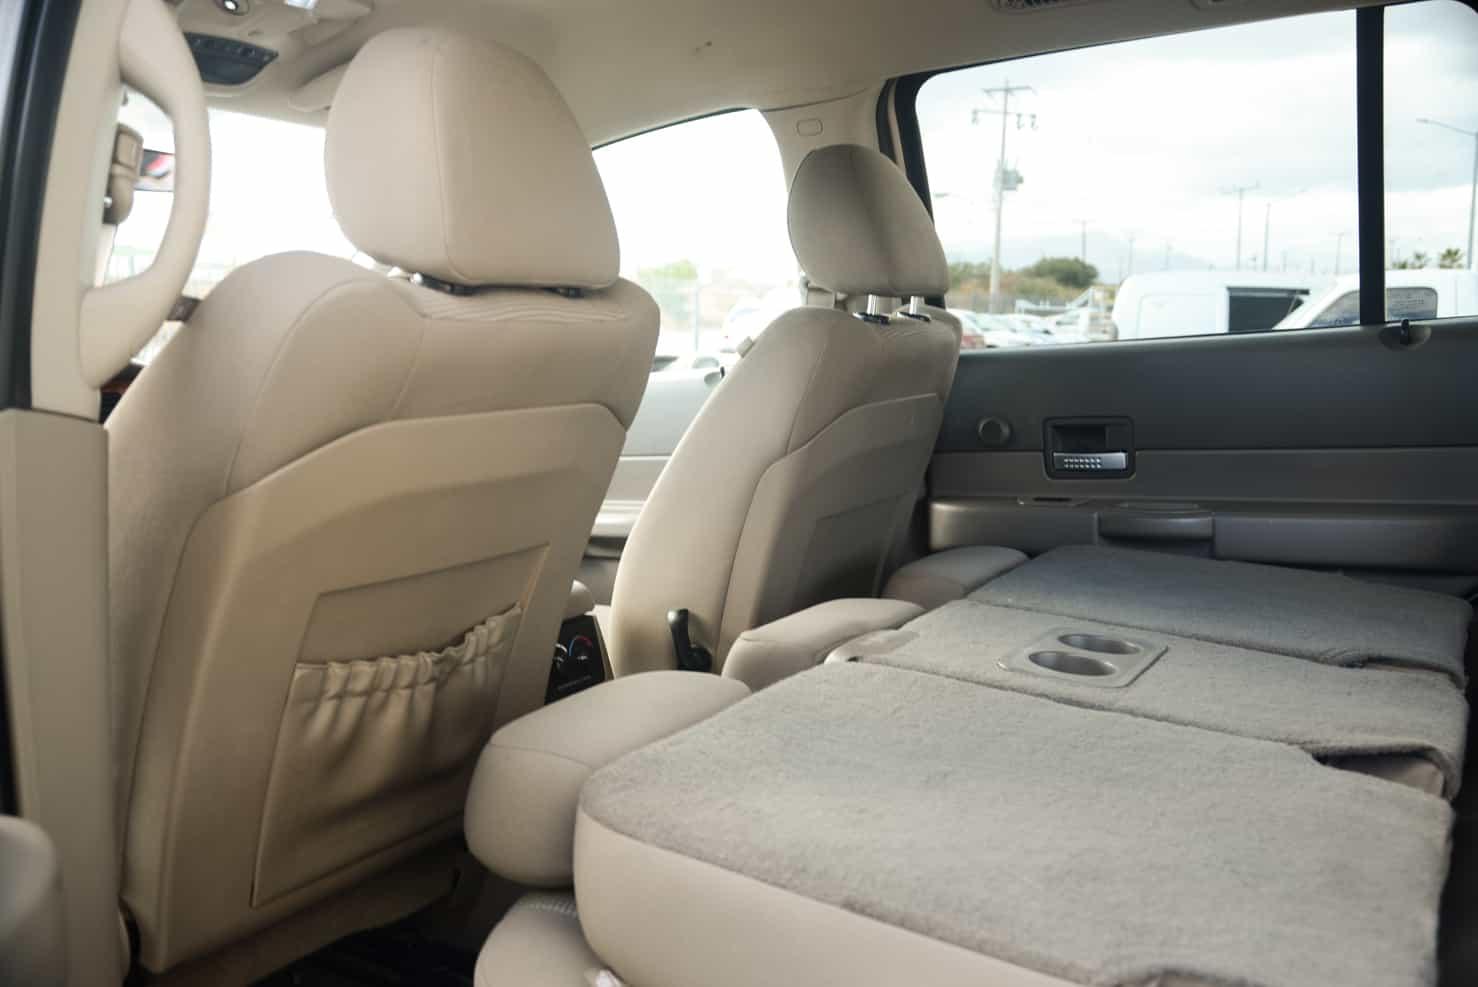 2nd seat folds down | Dodge Durango